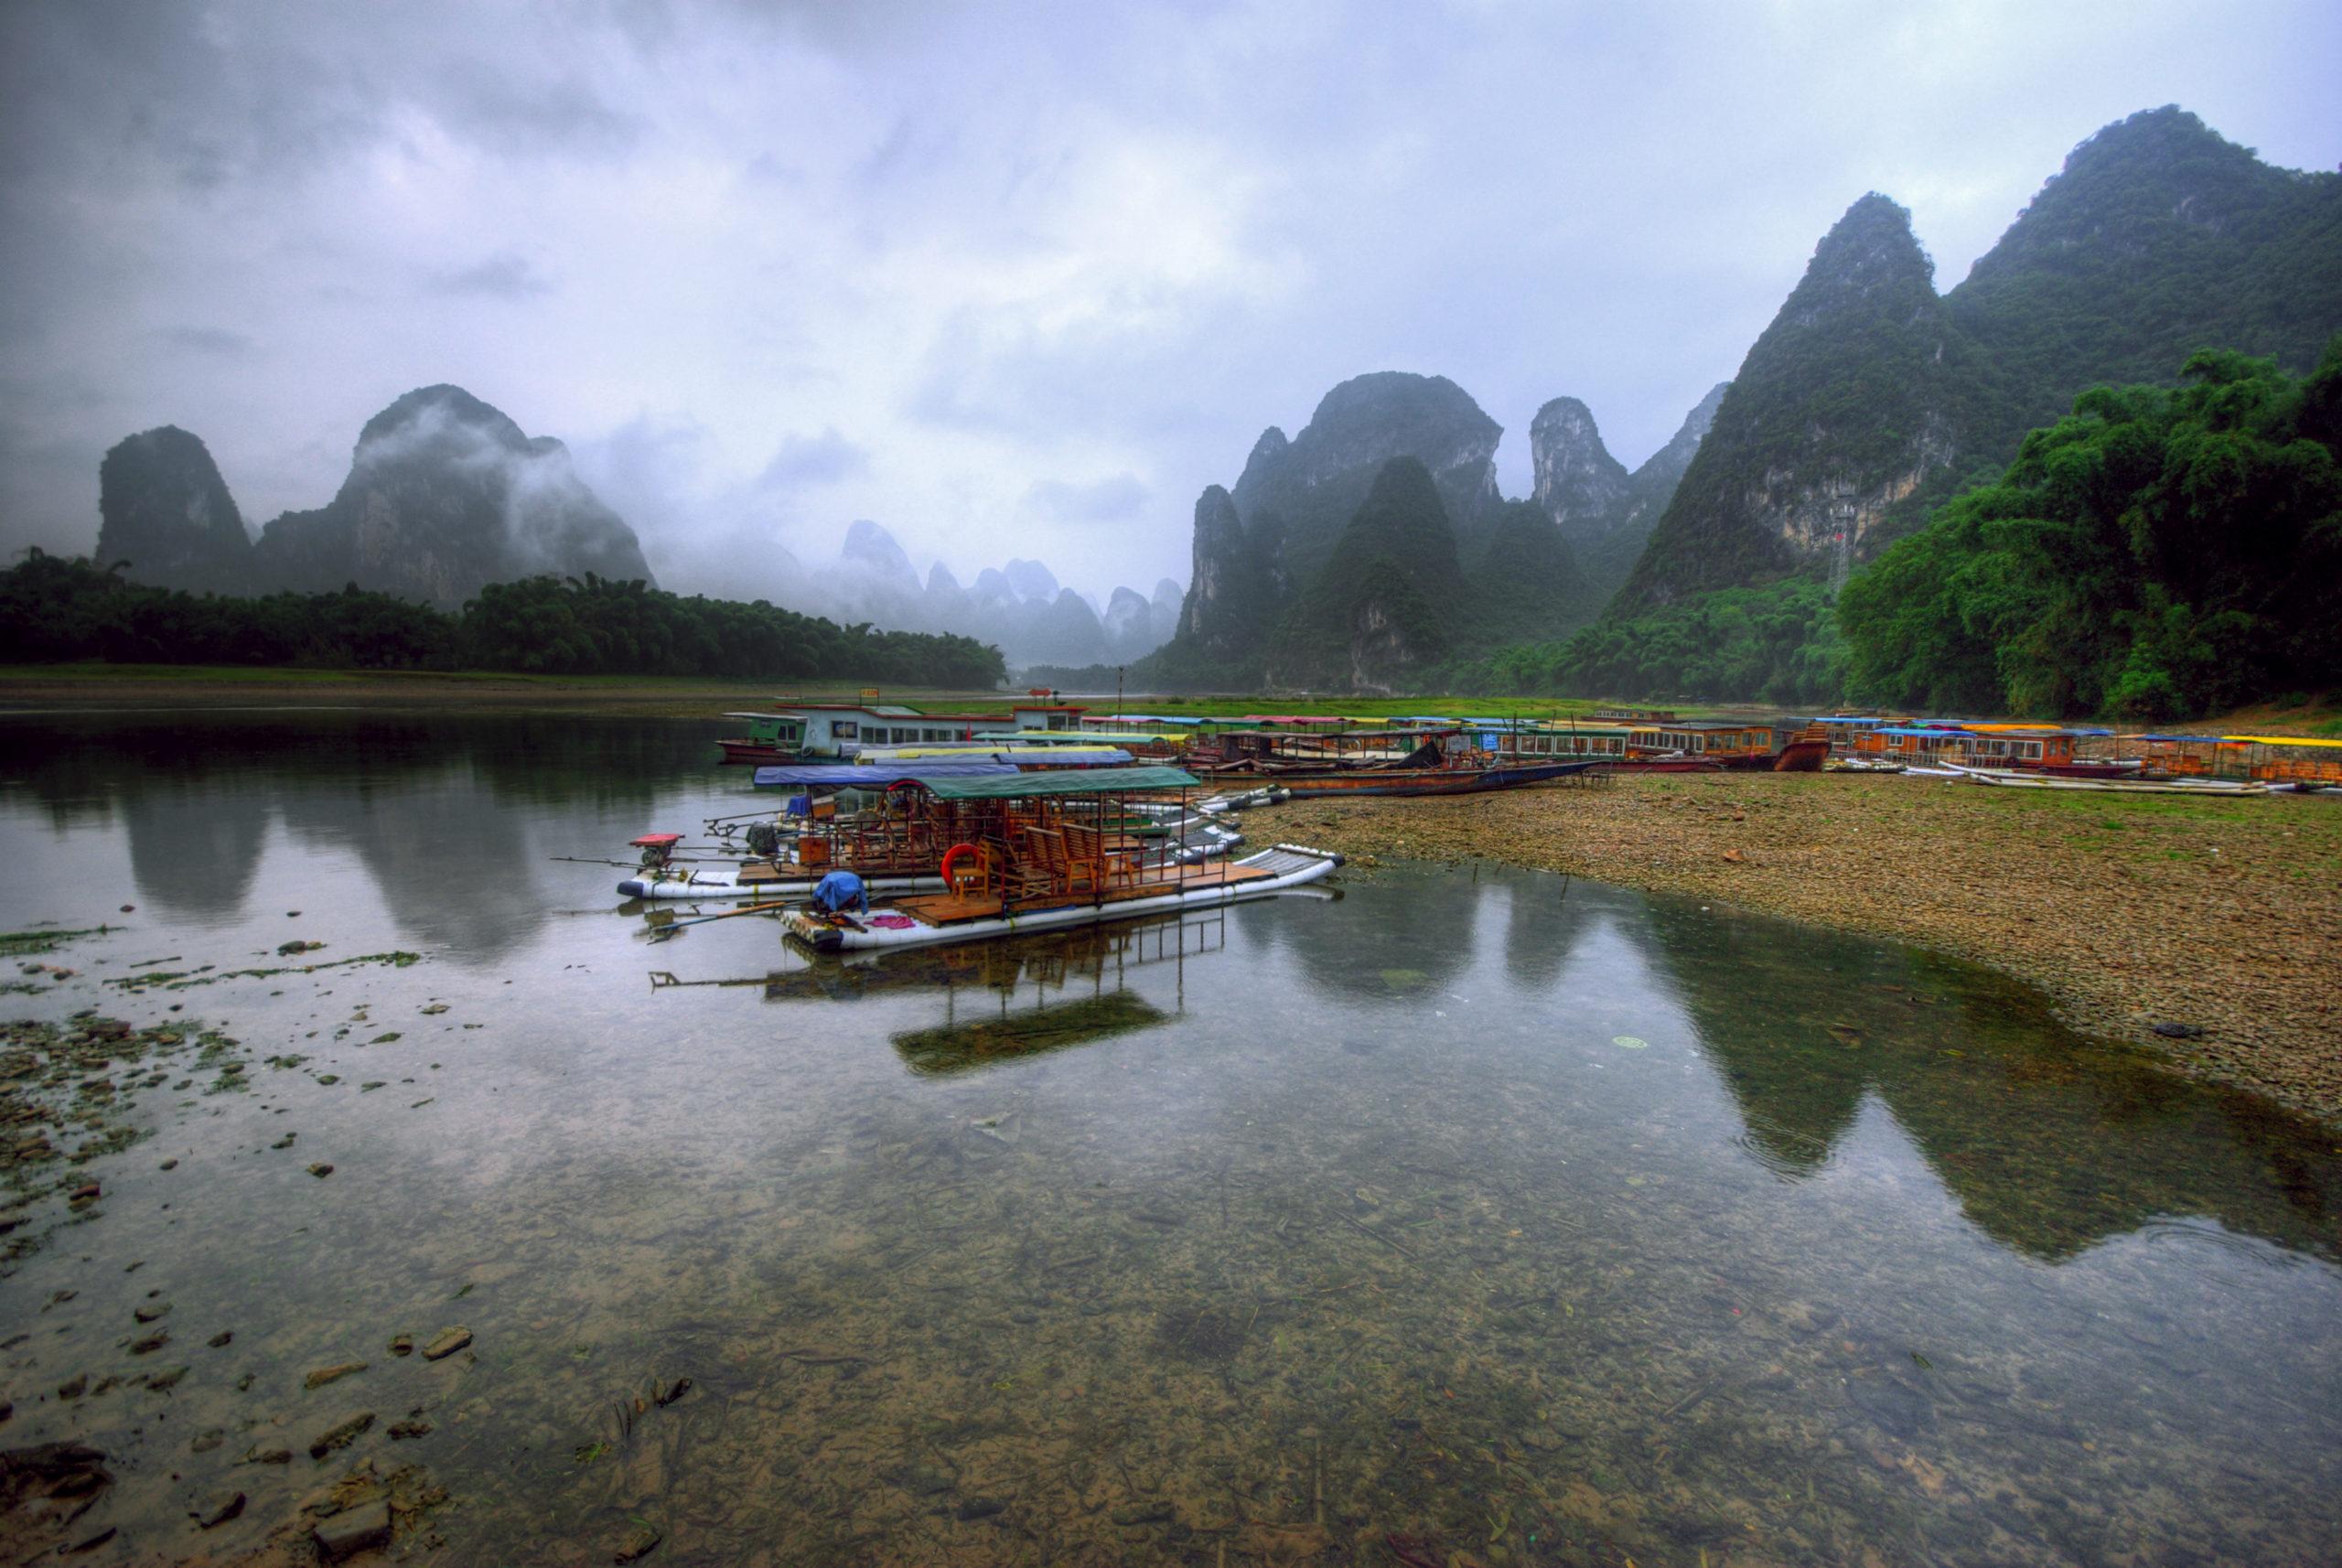 Morning in Xingping